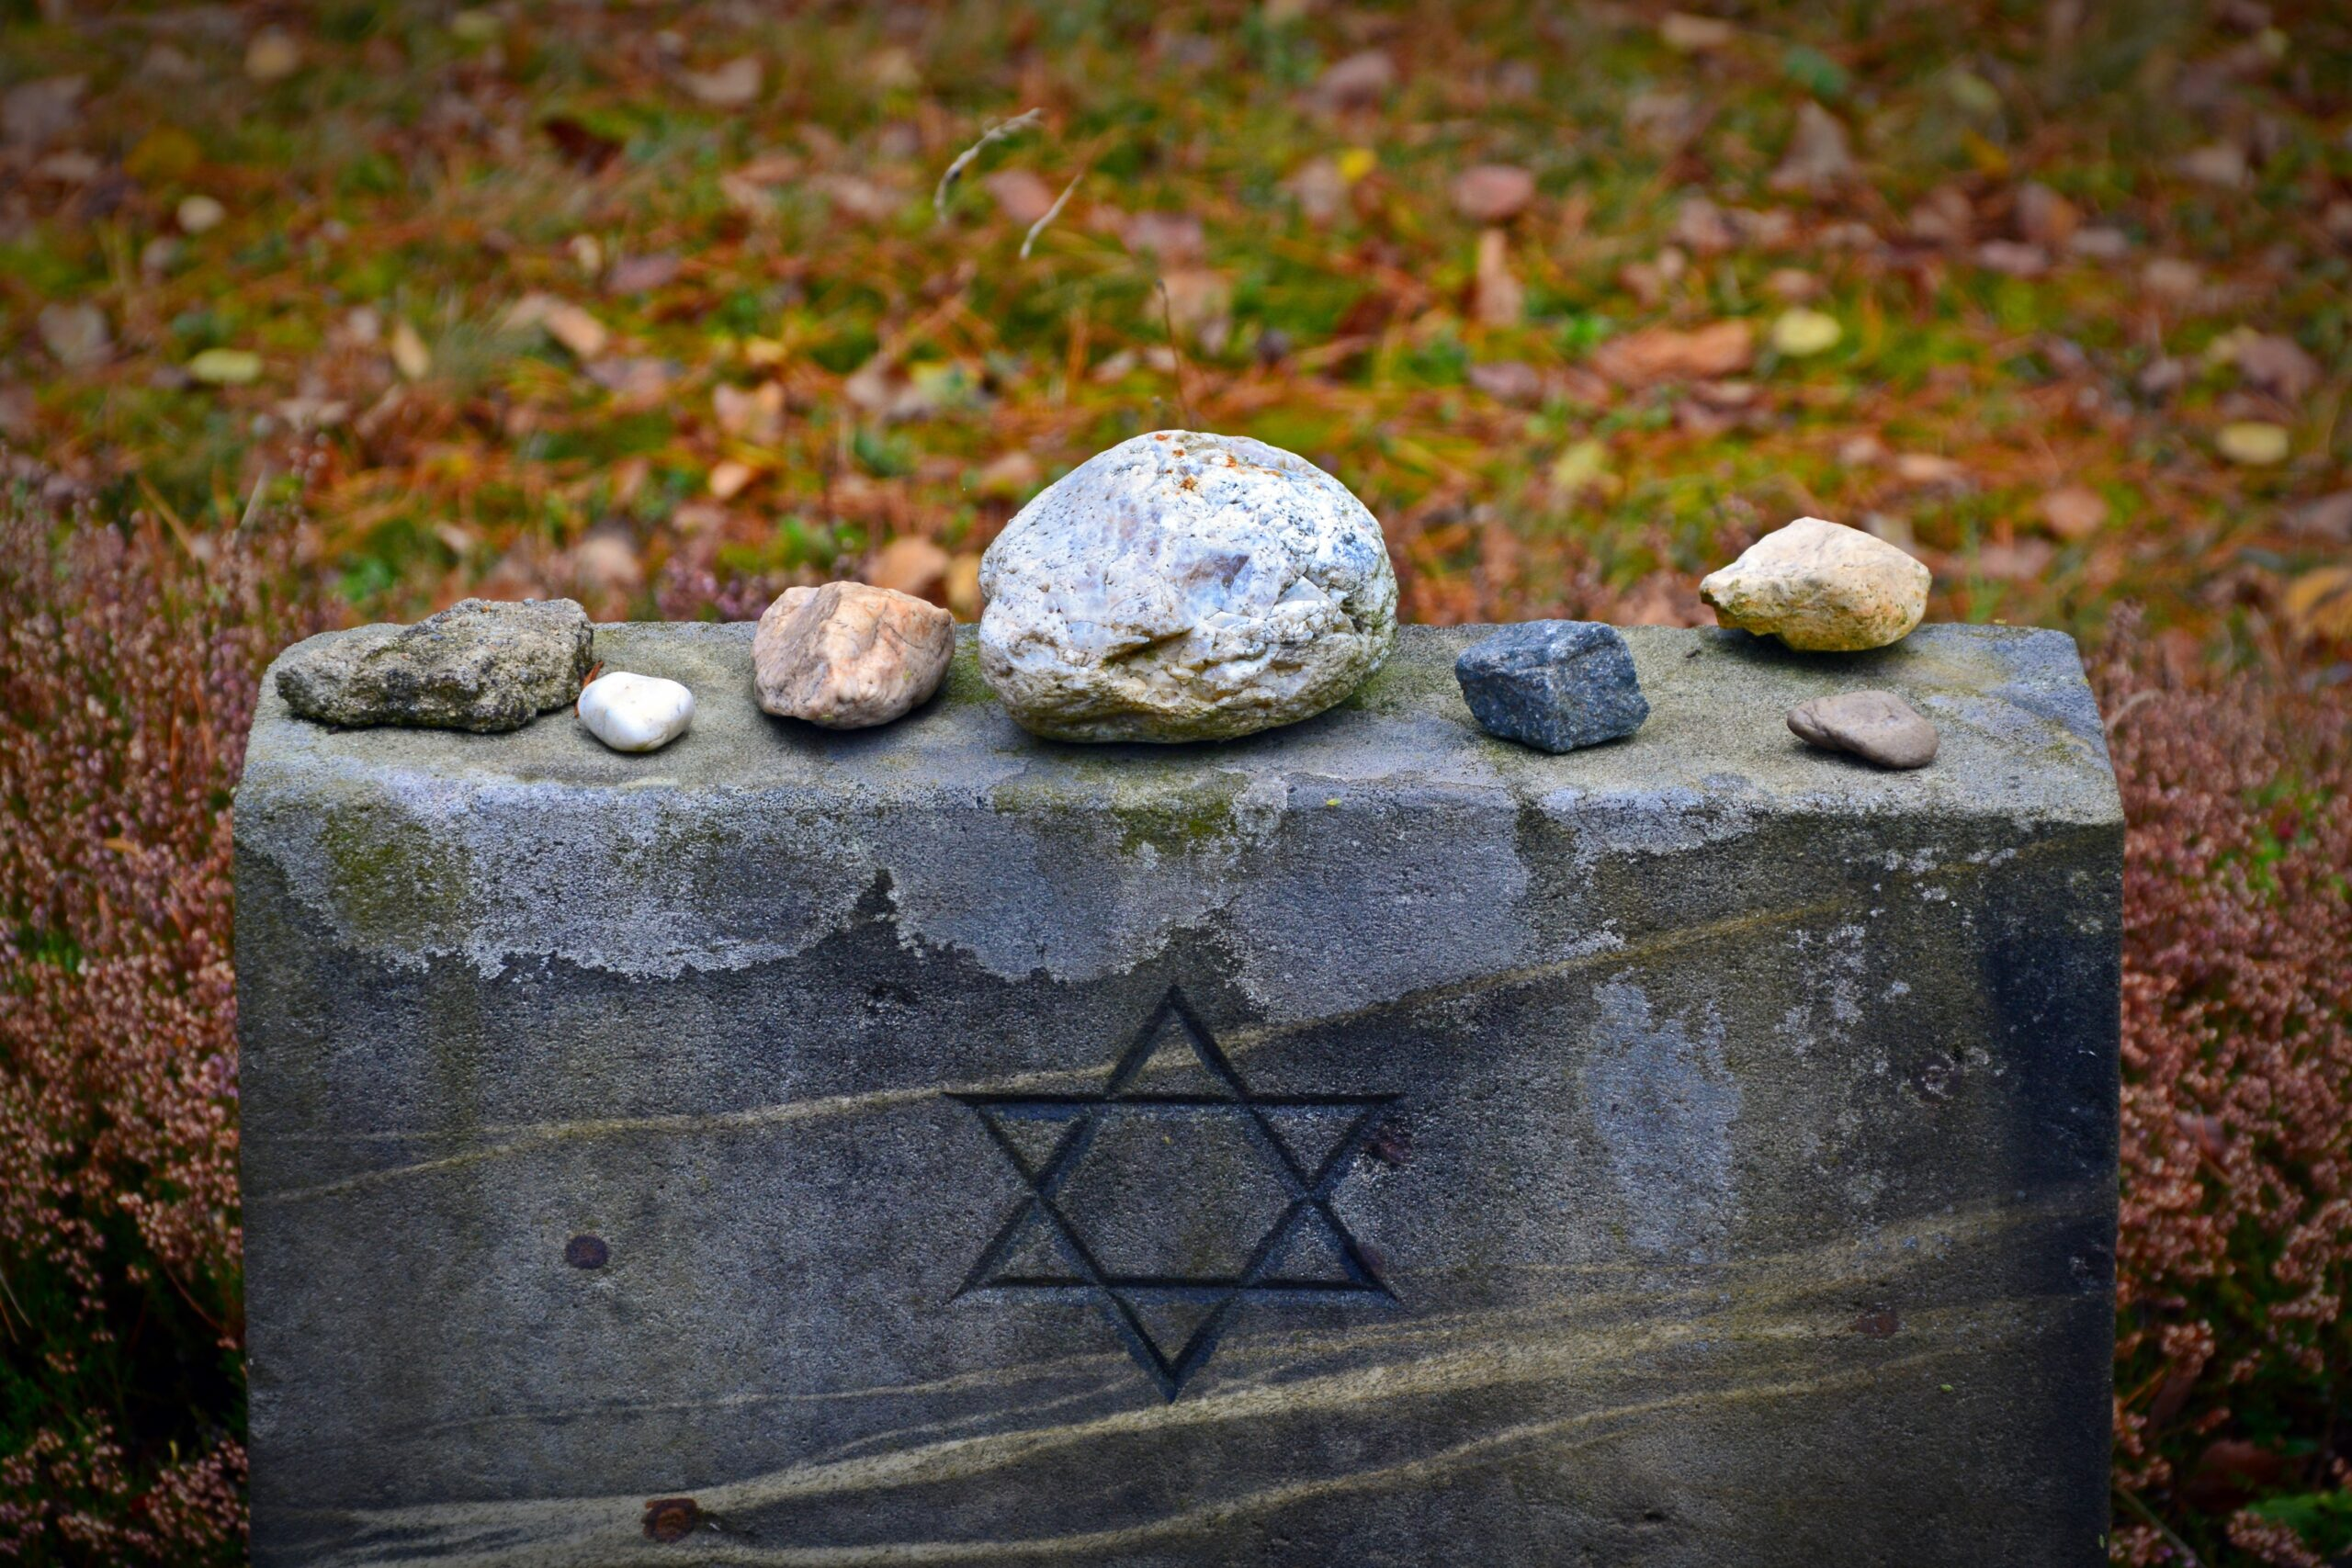 , In dedication of Holocaust Memorial Day, SnowCalmth